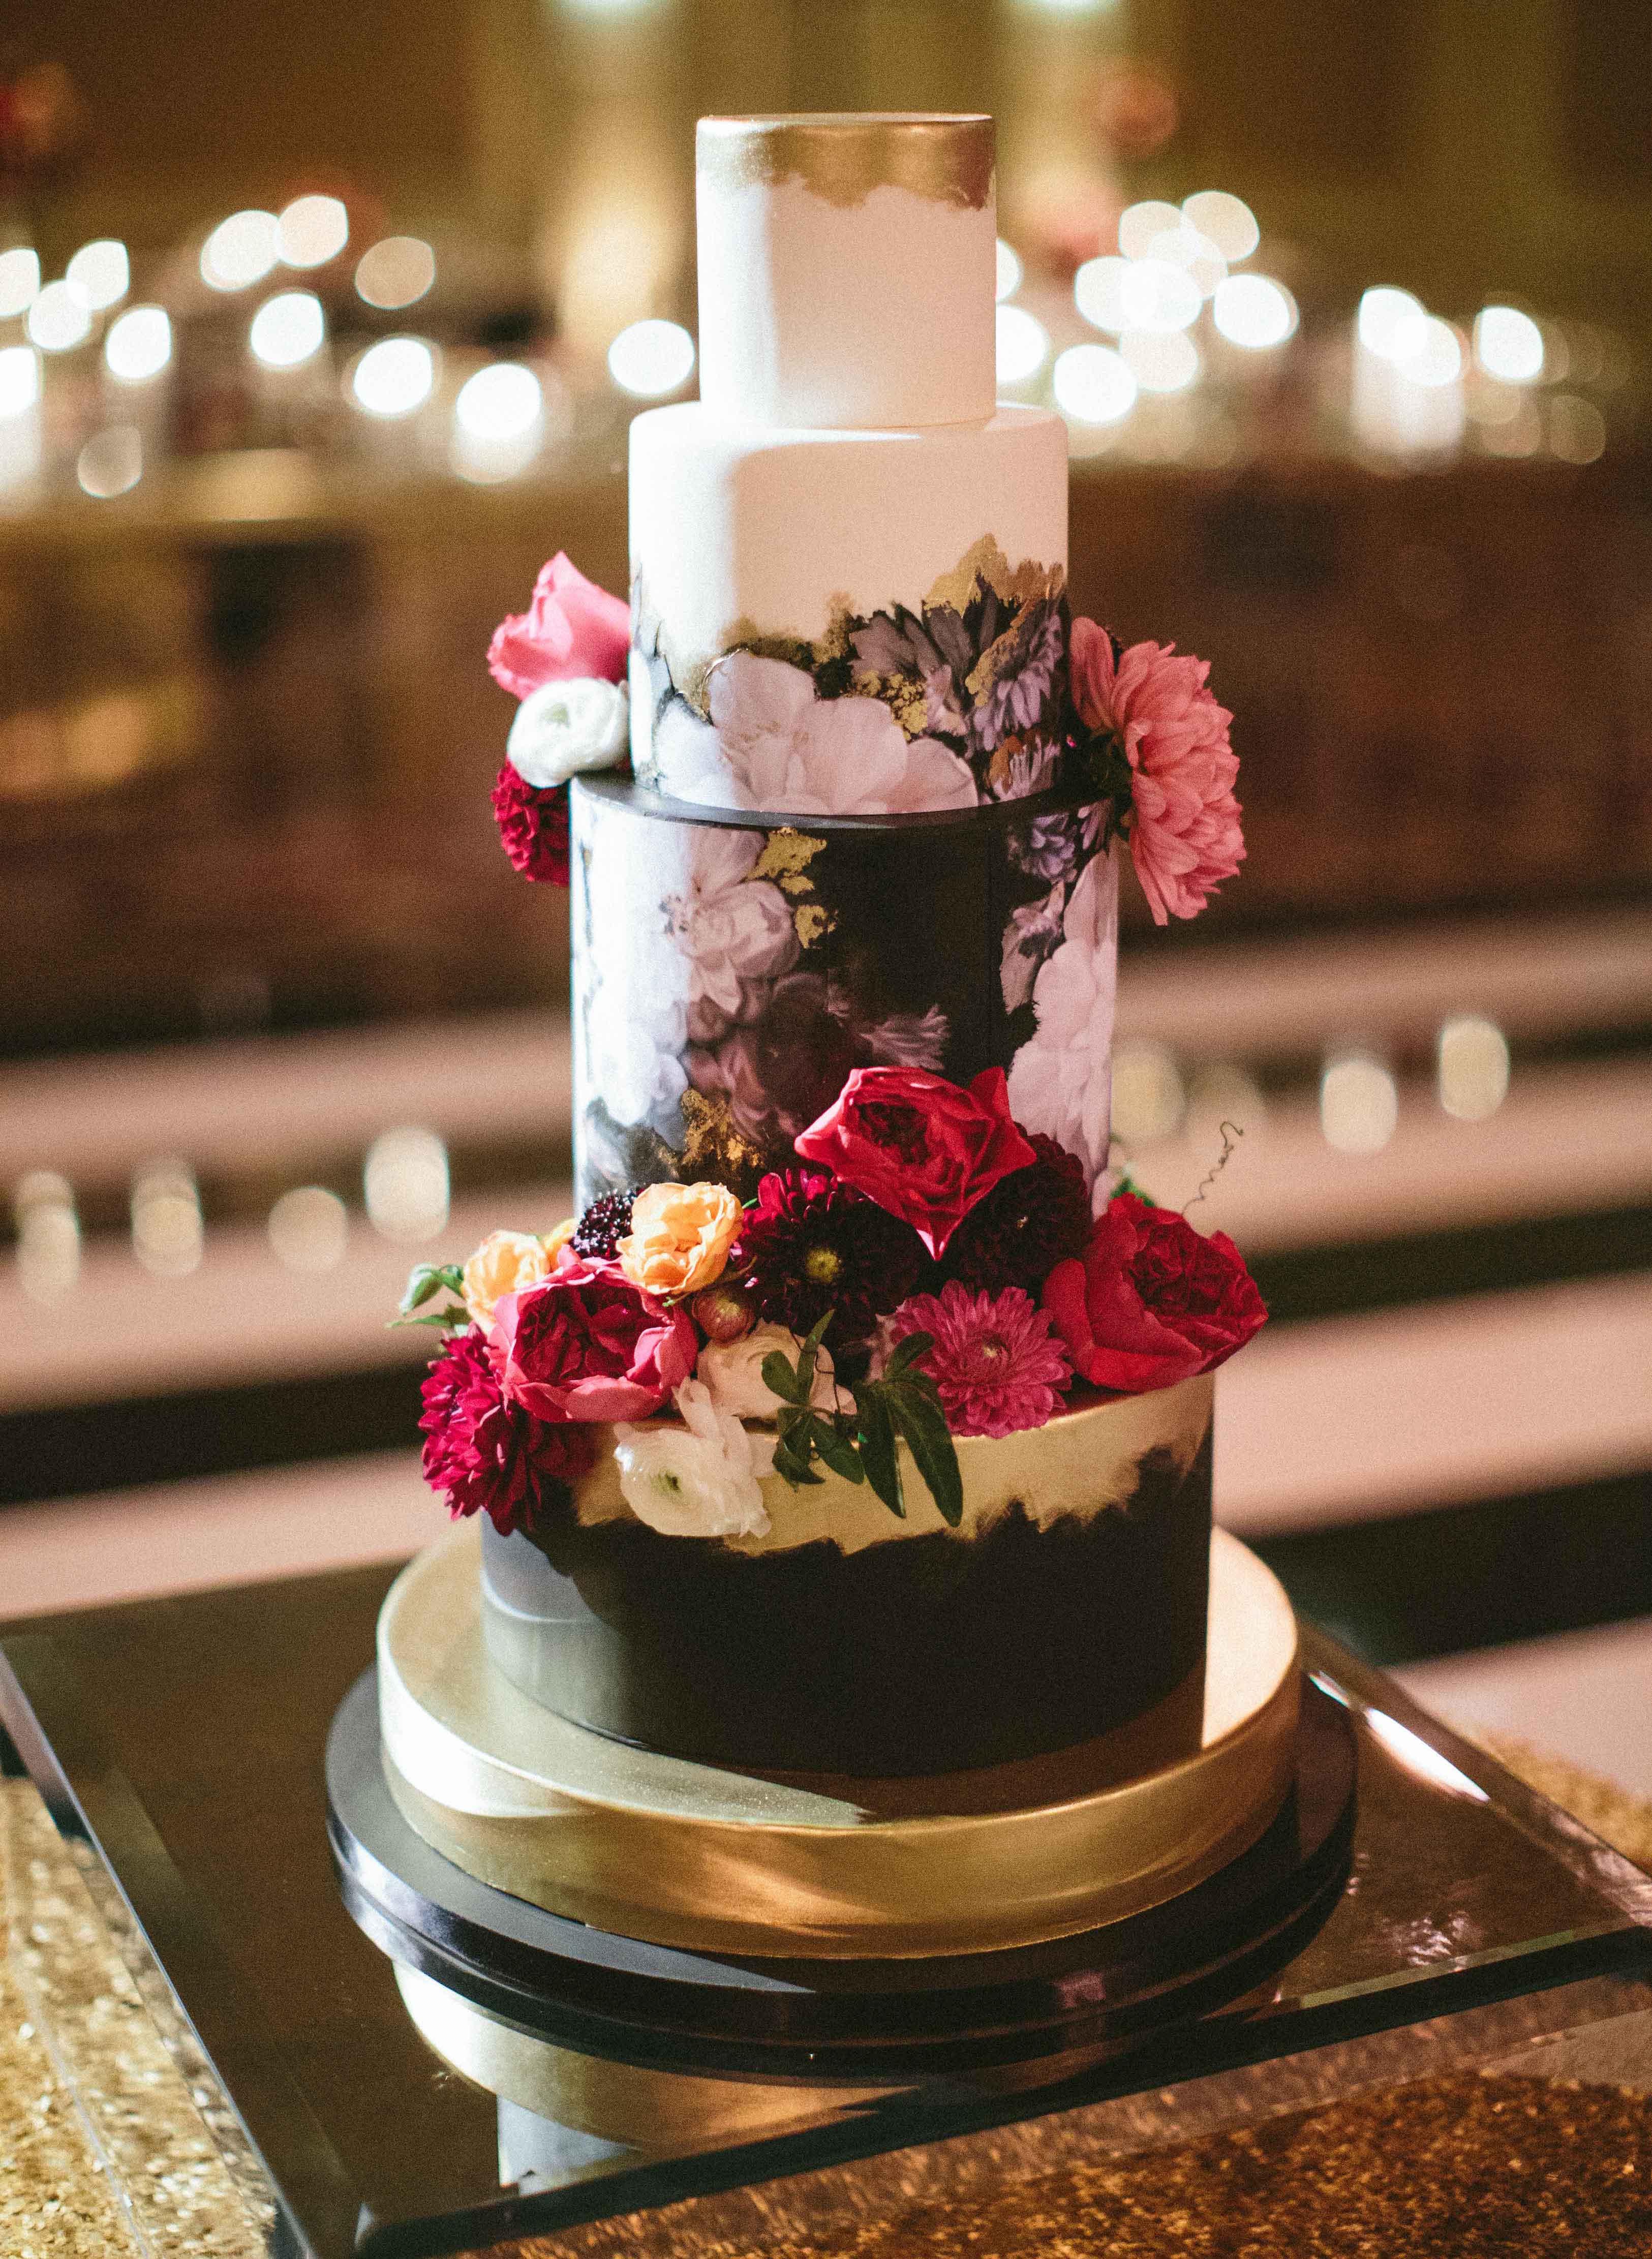 Dark and moody wedding color palette ideas dark floral wedding cake